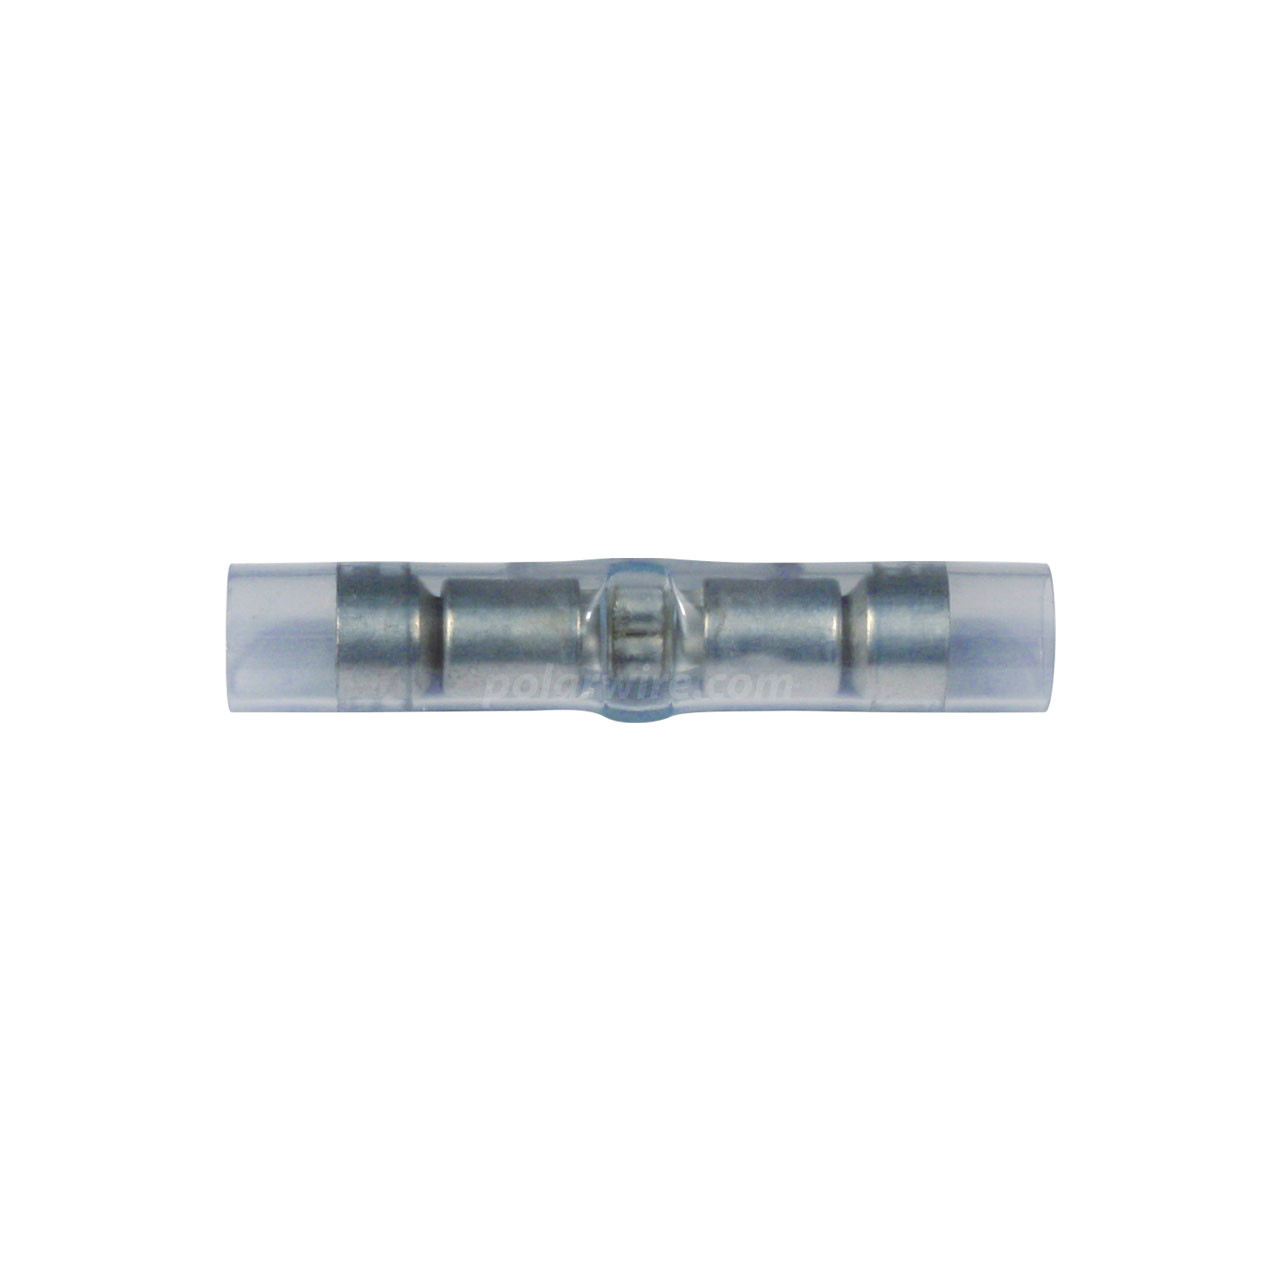 NYLON WINDOW BUTT 16-14GA 100 PACK MOLEX - Polar Wire Products